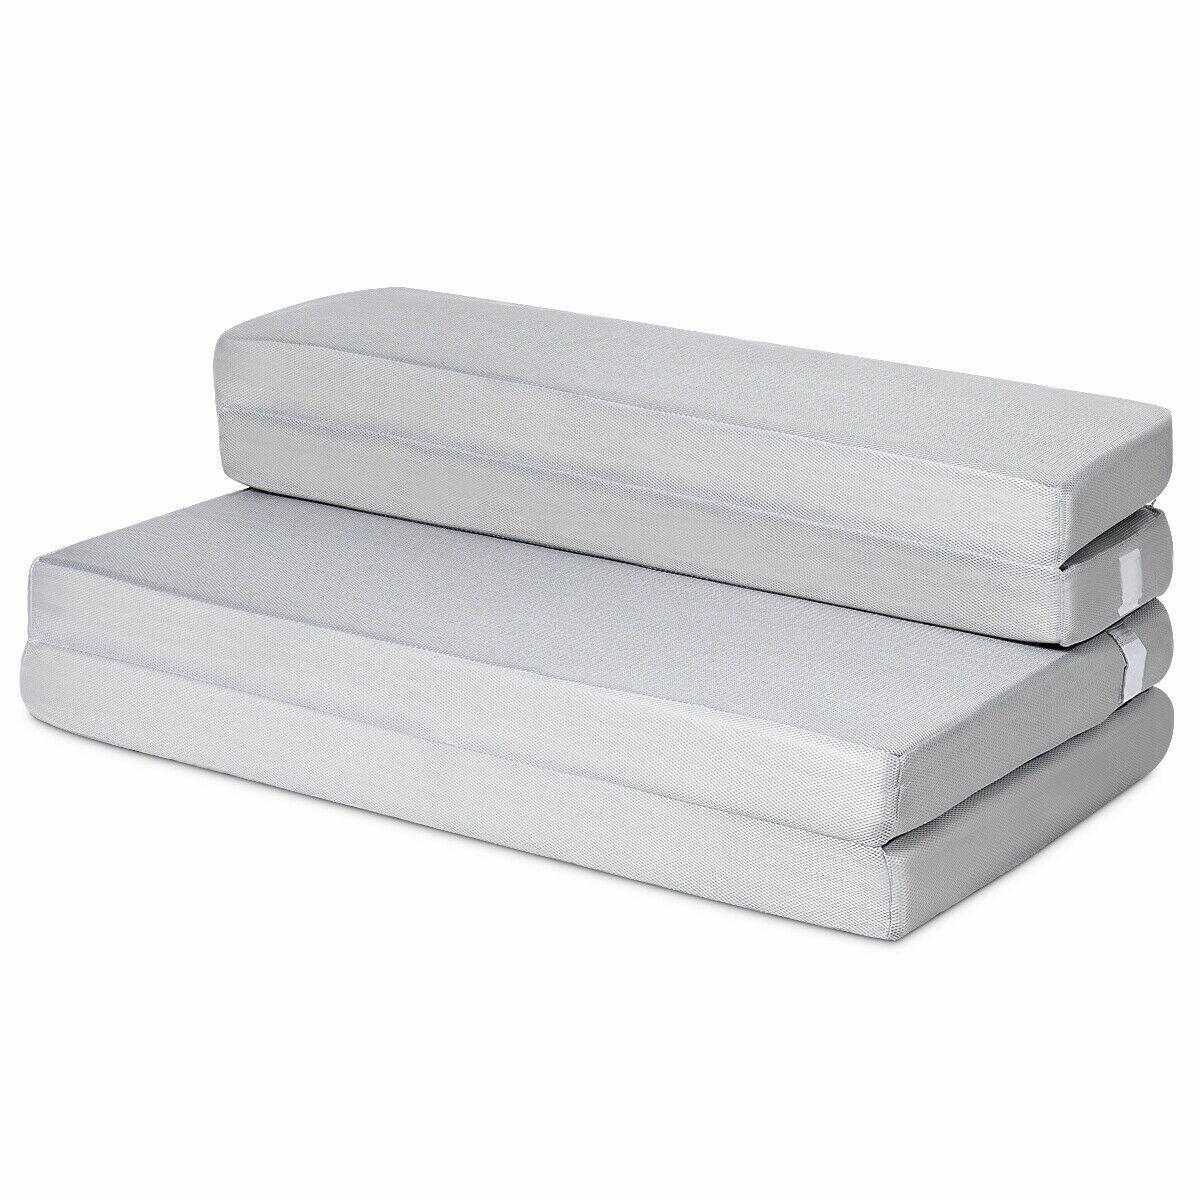 4 Full Xl Size Foam Folding Mattress Sofa Bed Guests Floor Mat